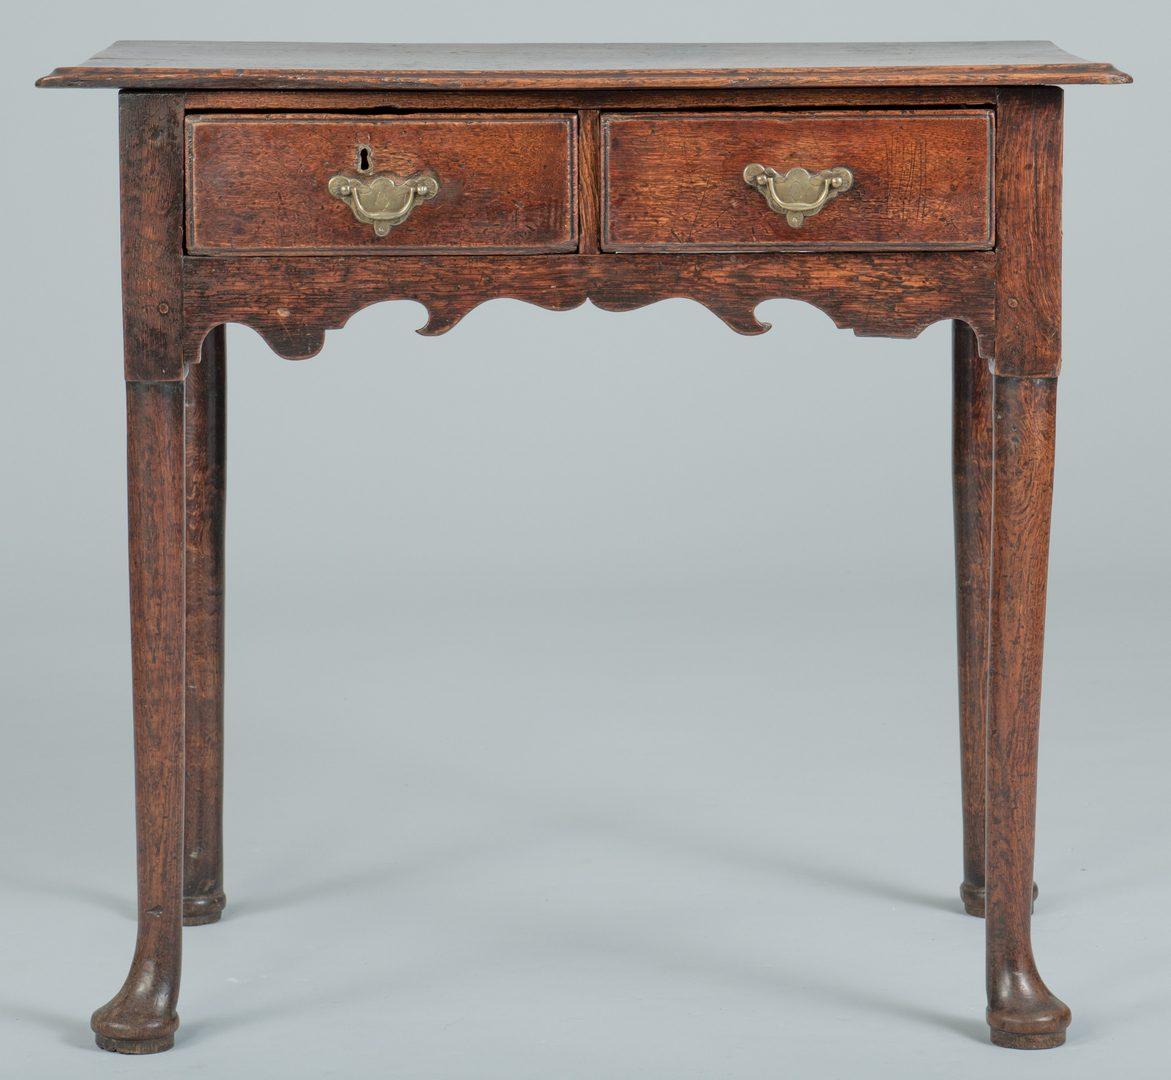 Lot 99: 18th C. Oak Dressing Table or Lowboy